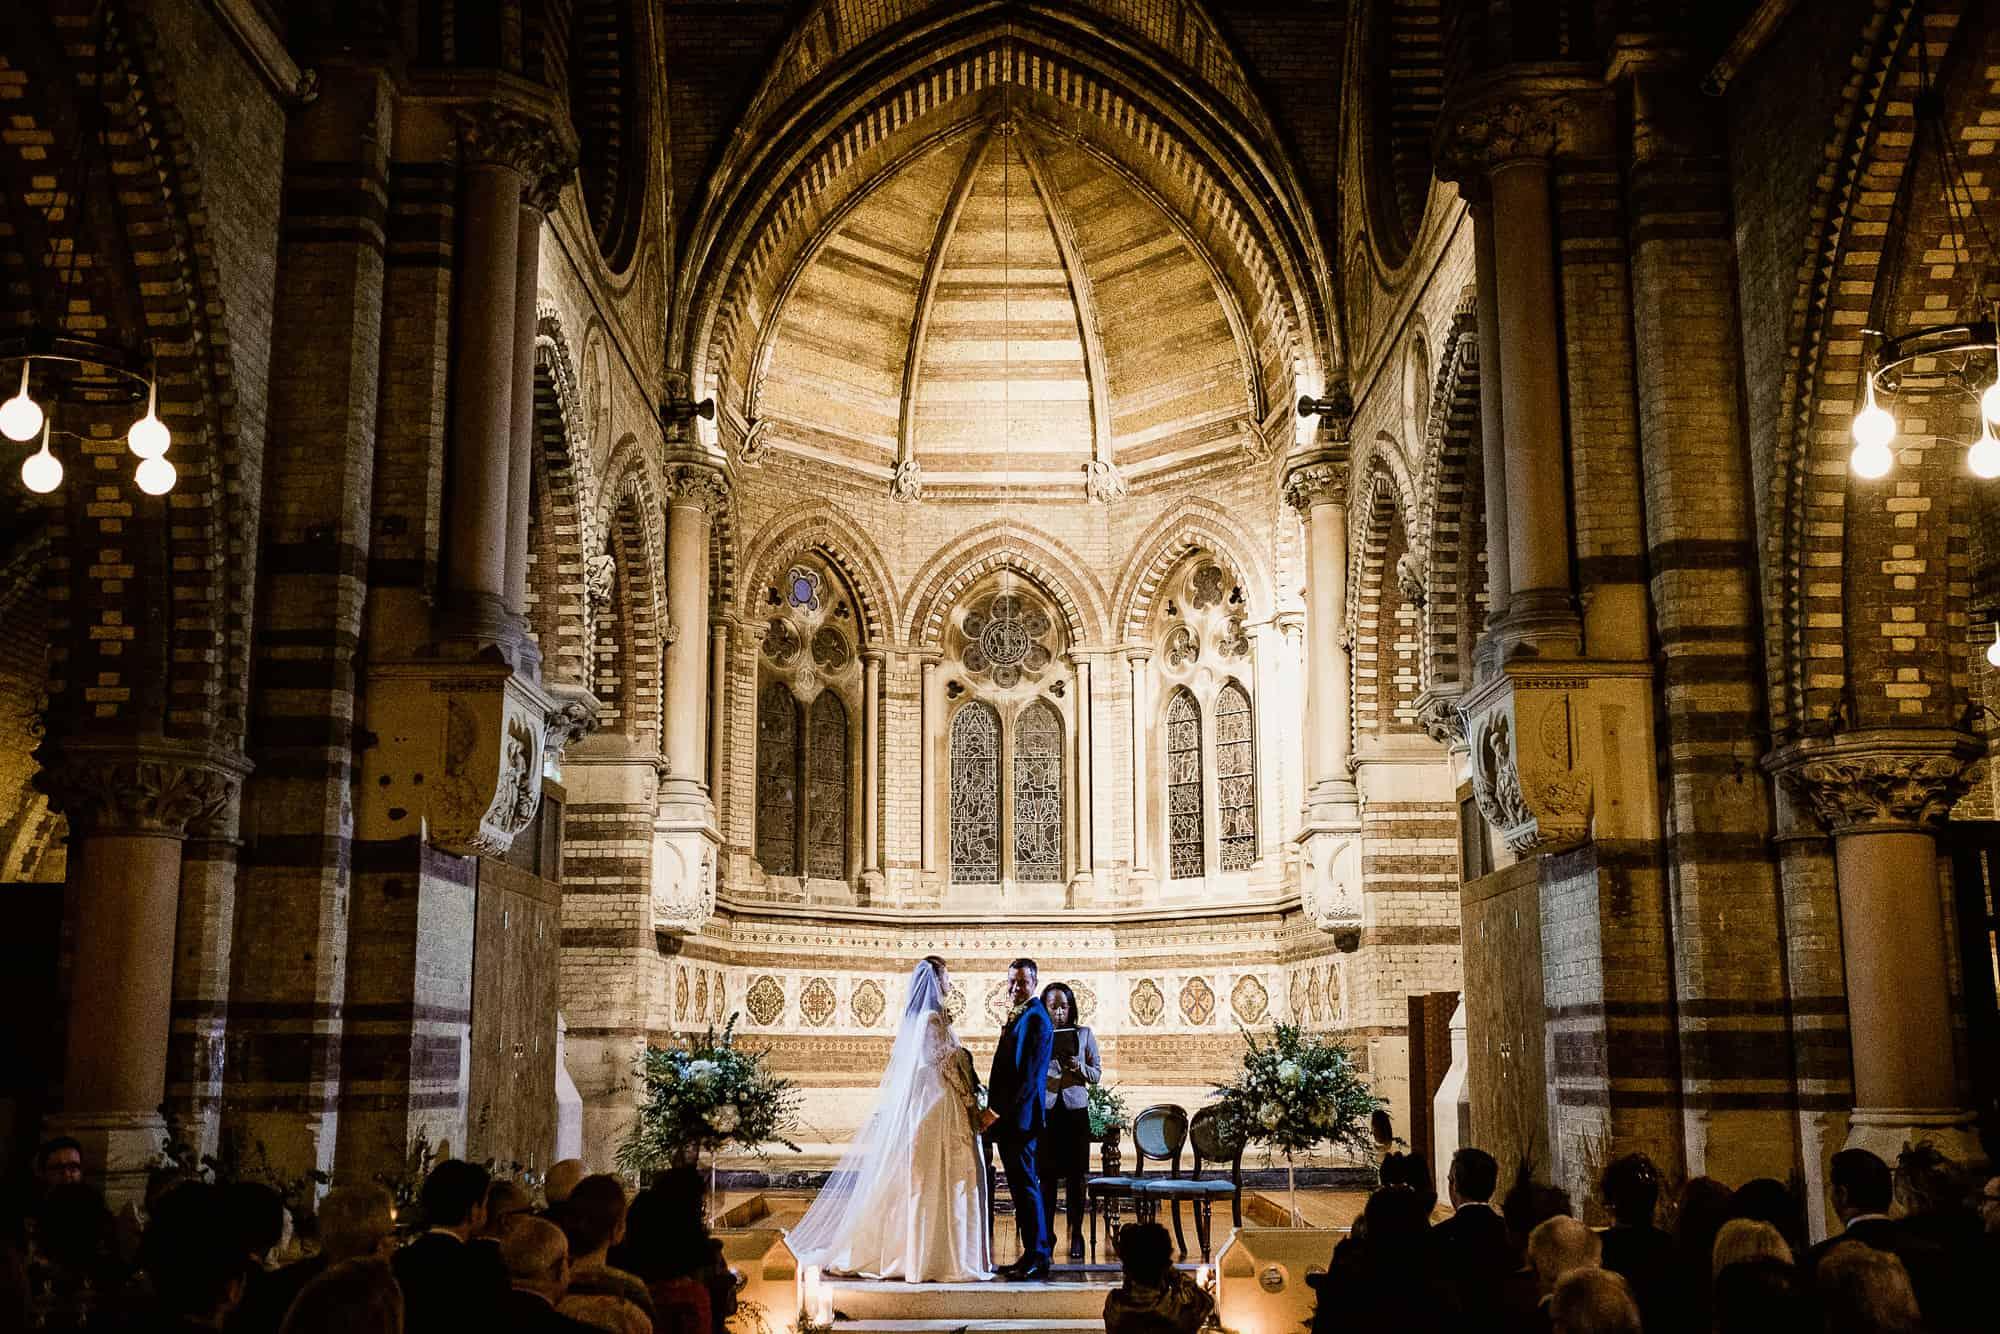 st-stephens-wedding-photographer-matt-tyler-0027